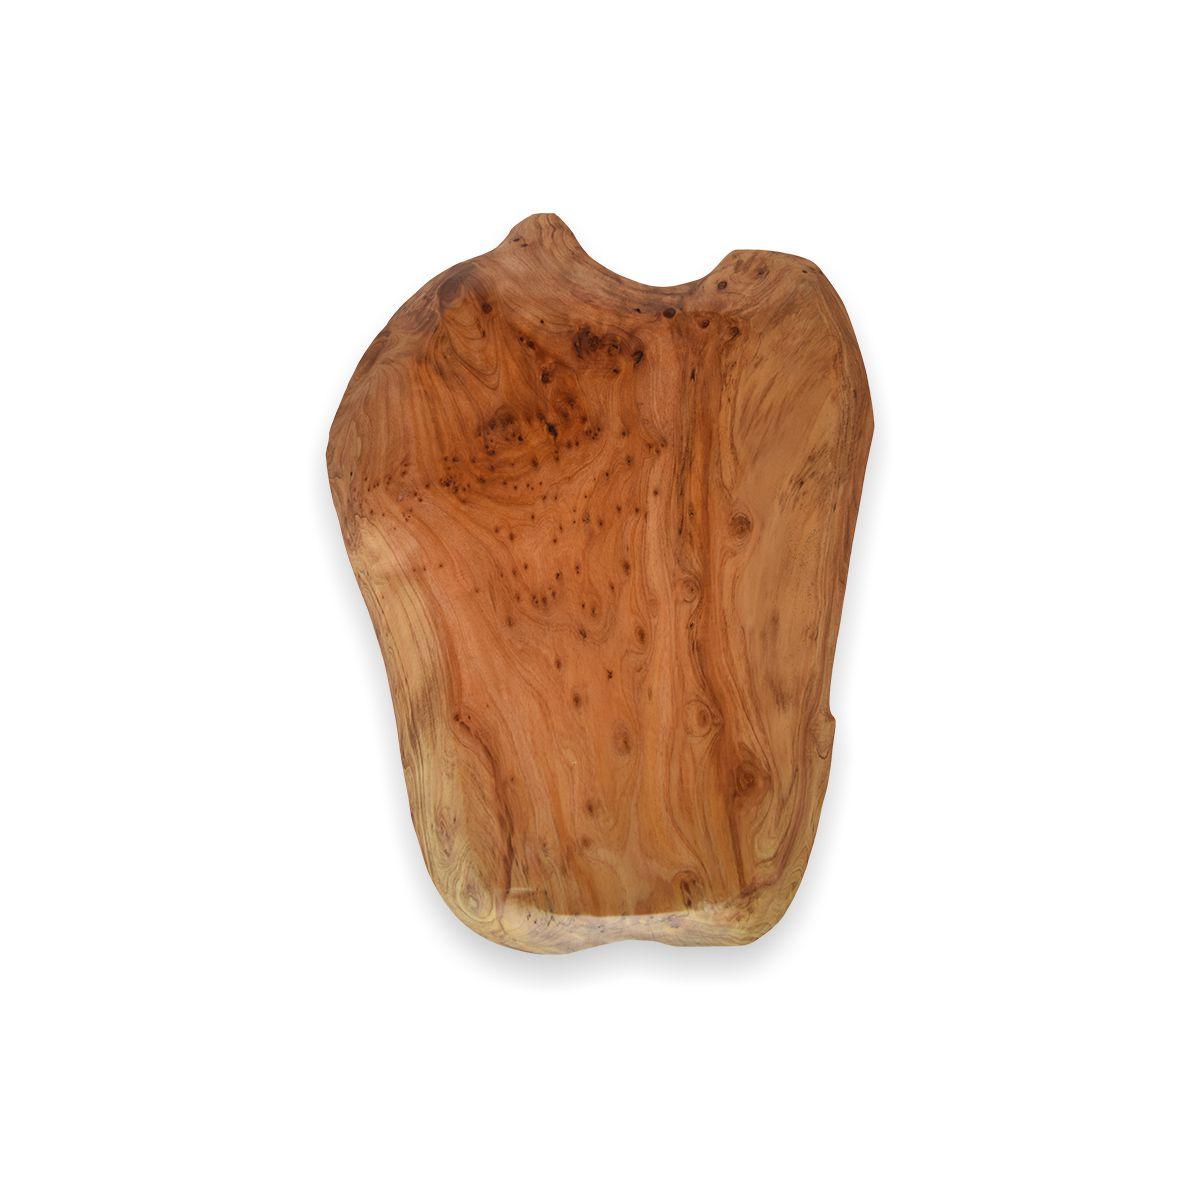 Peça Rustic Madeira Artesanal Exclusiva 1